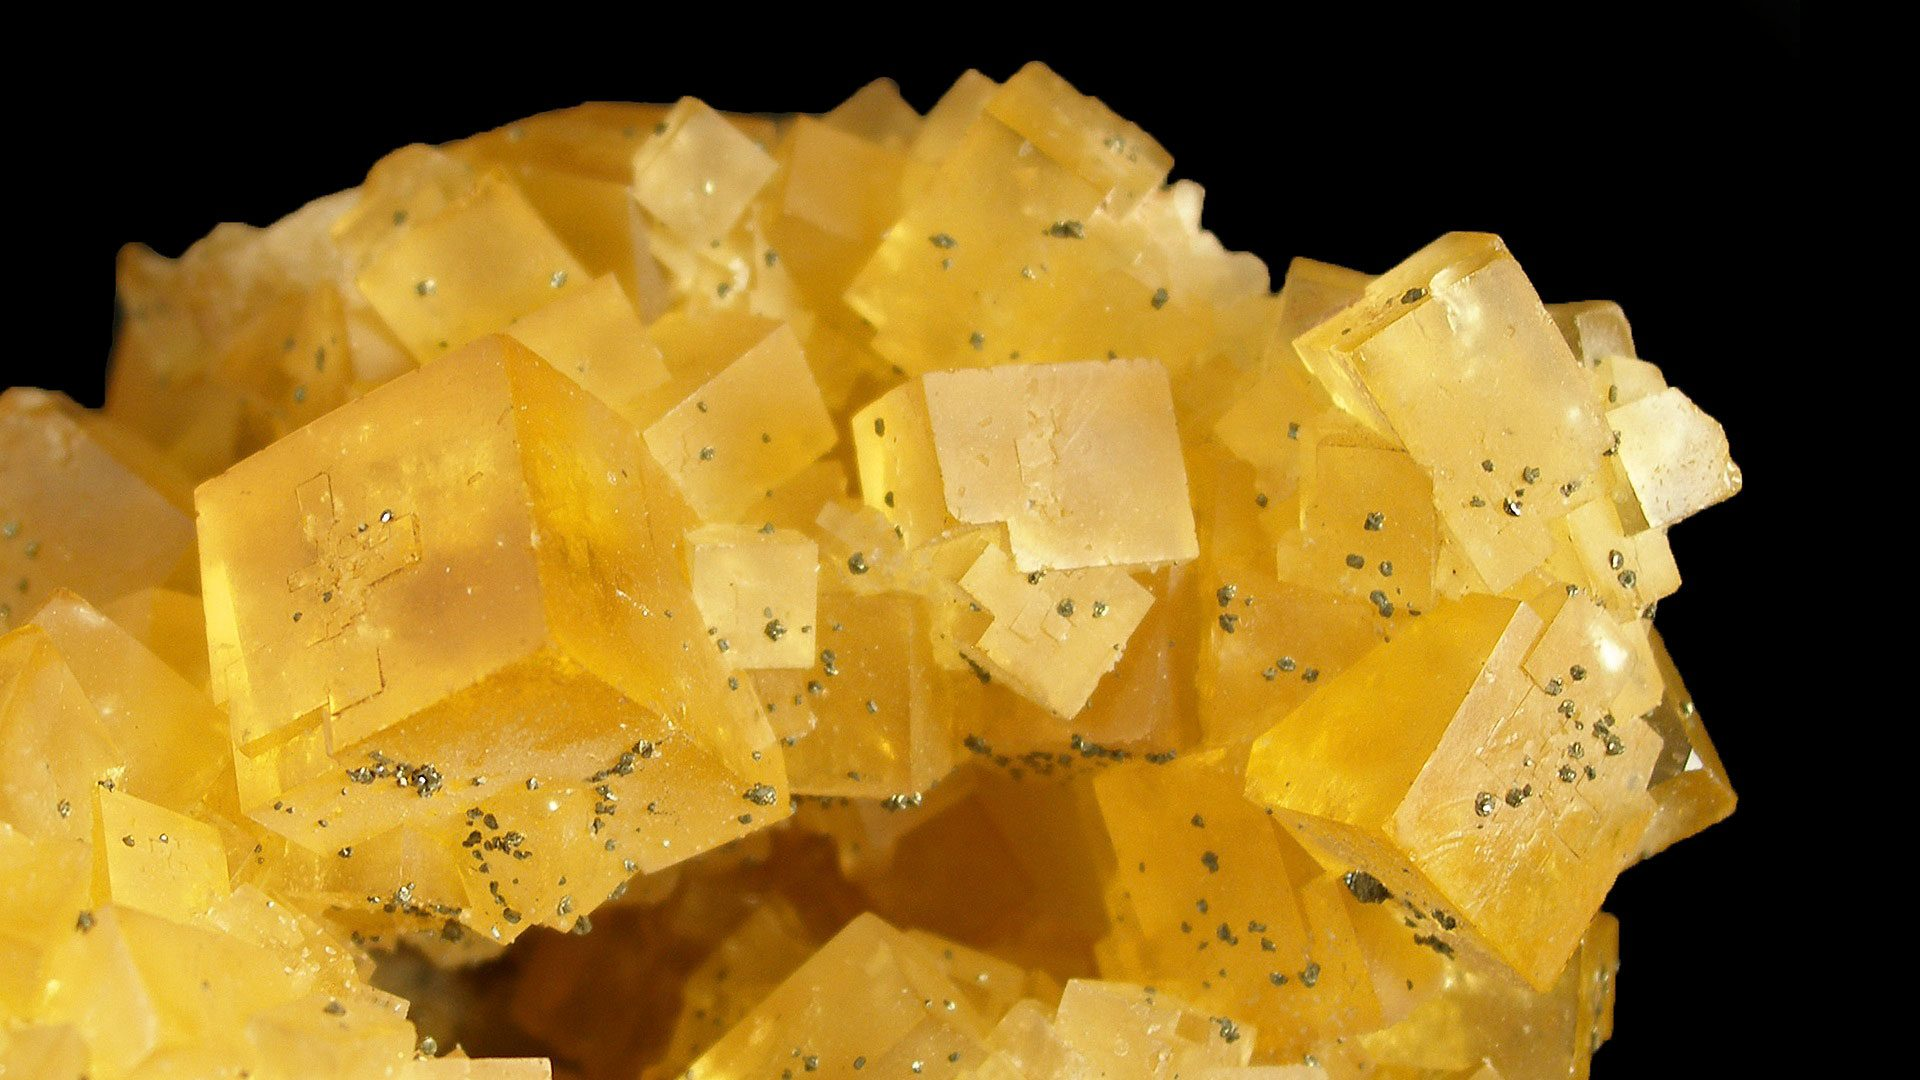 Gold Fluorite Cluster Specimen - Photograph by Rob Lavinsky, iRocks.com